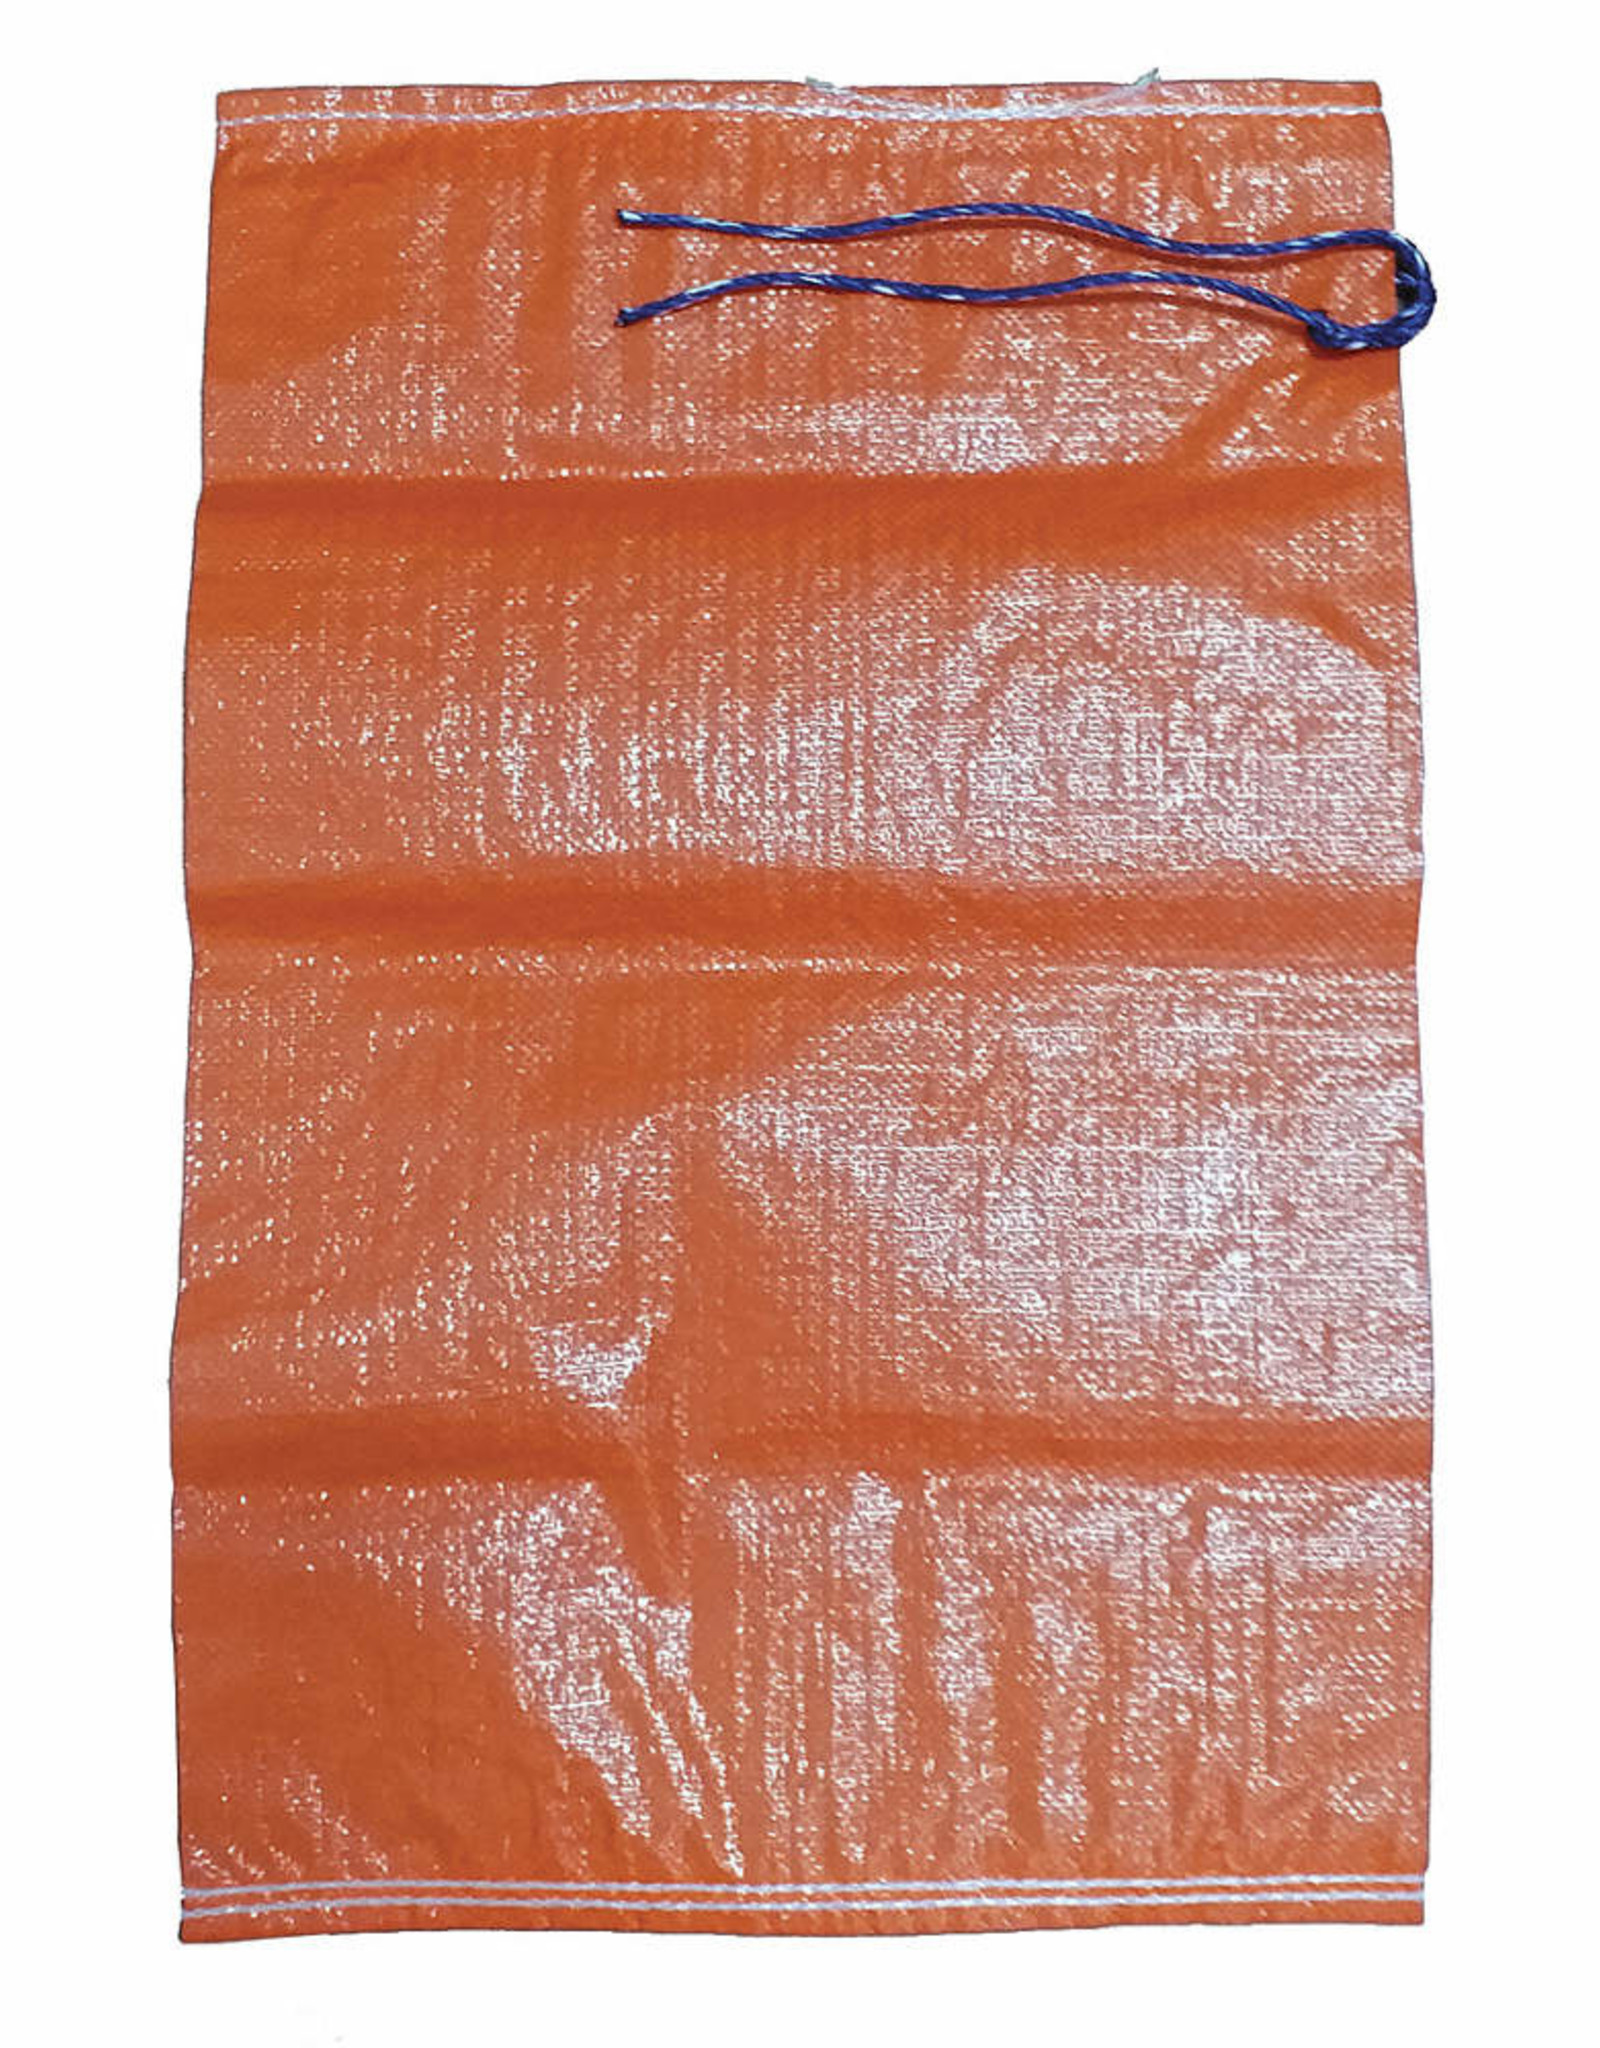 "Individual Sand Bag, SZ. 14"" x 26"", Orange Woven Polypropylene"